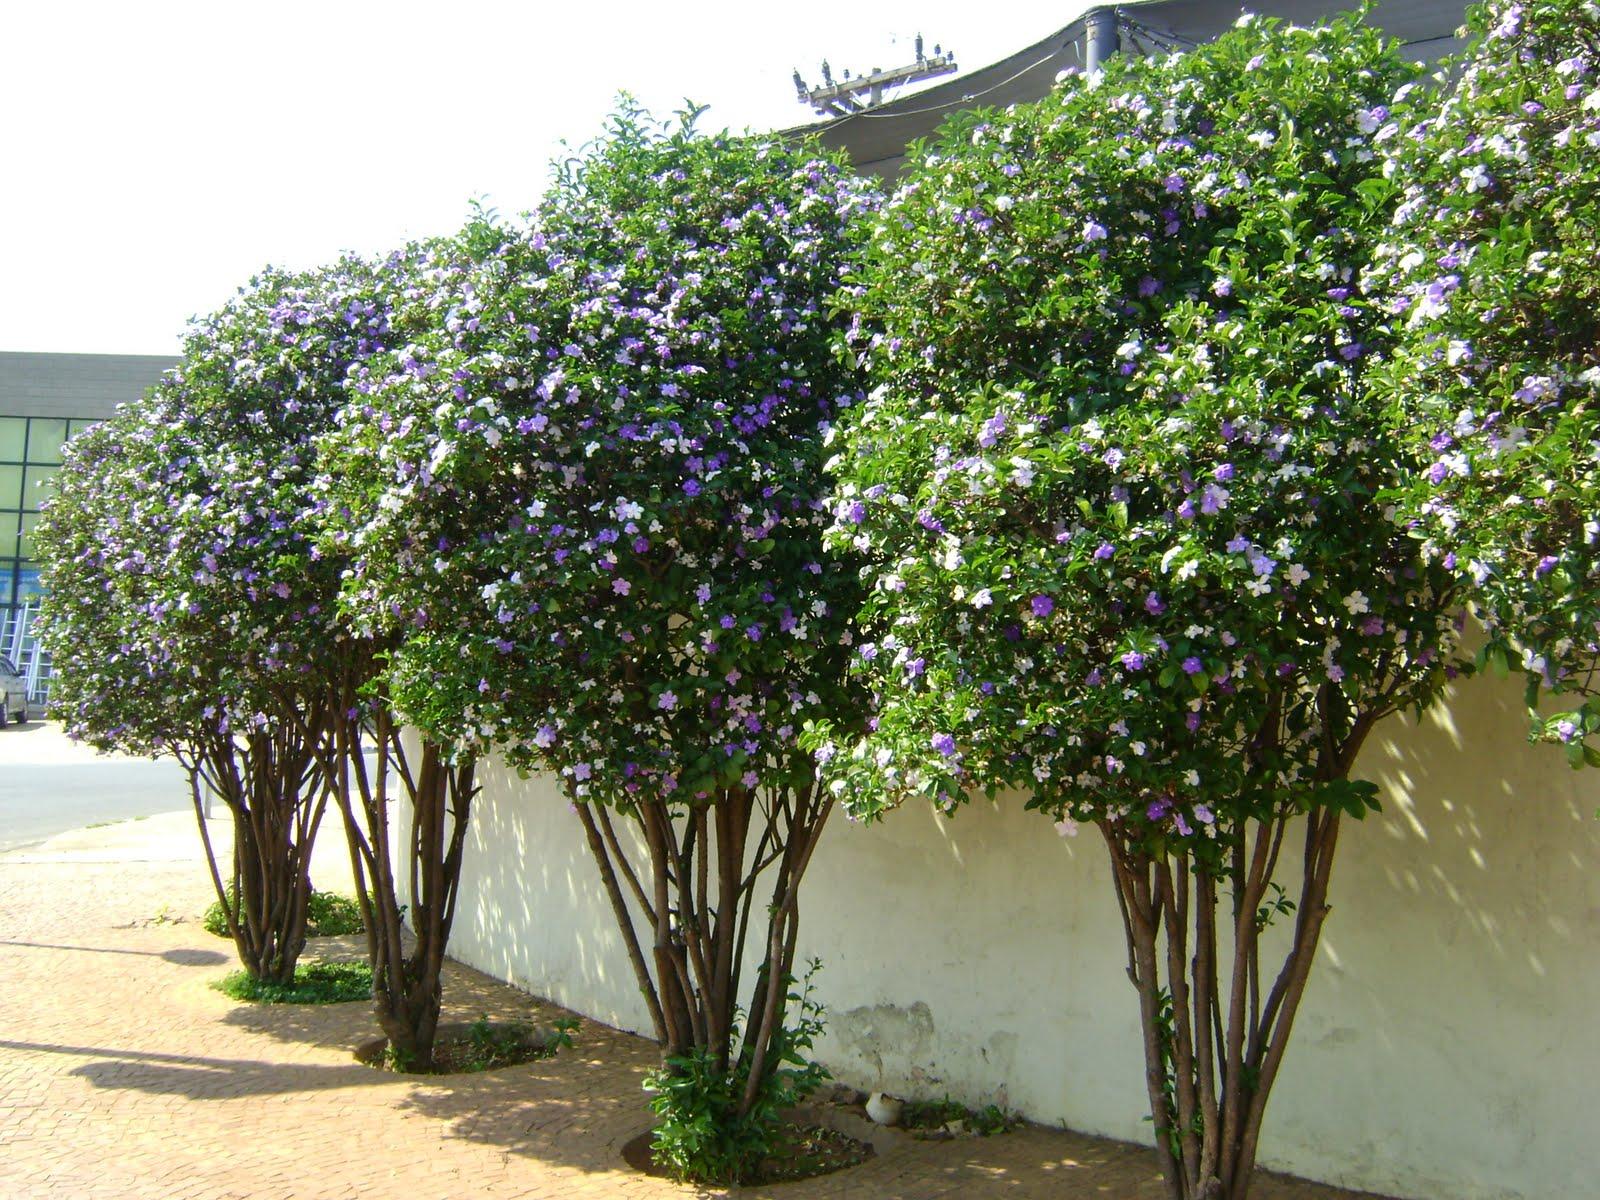 manaca de jardim em vaso : manaca de jardim em vaso: Fascinante: Brunfelsia Unifloravulgo Manacá de Cheiro